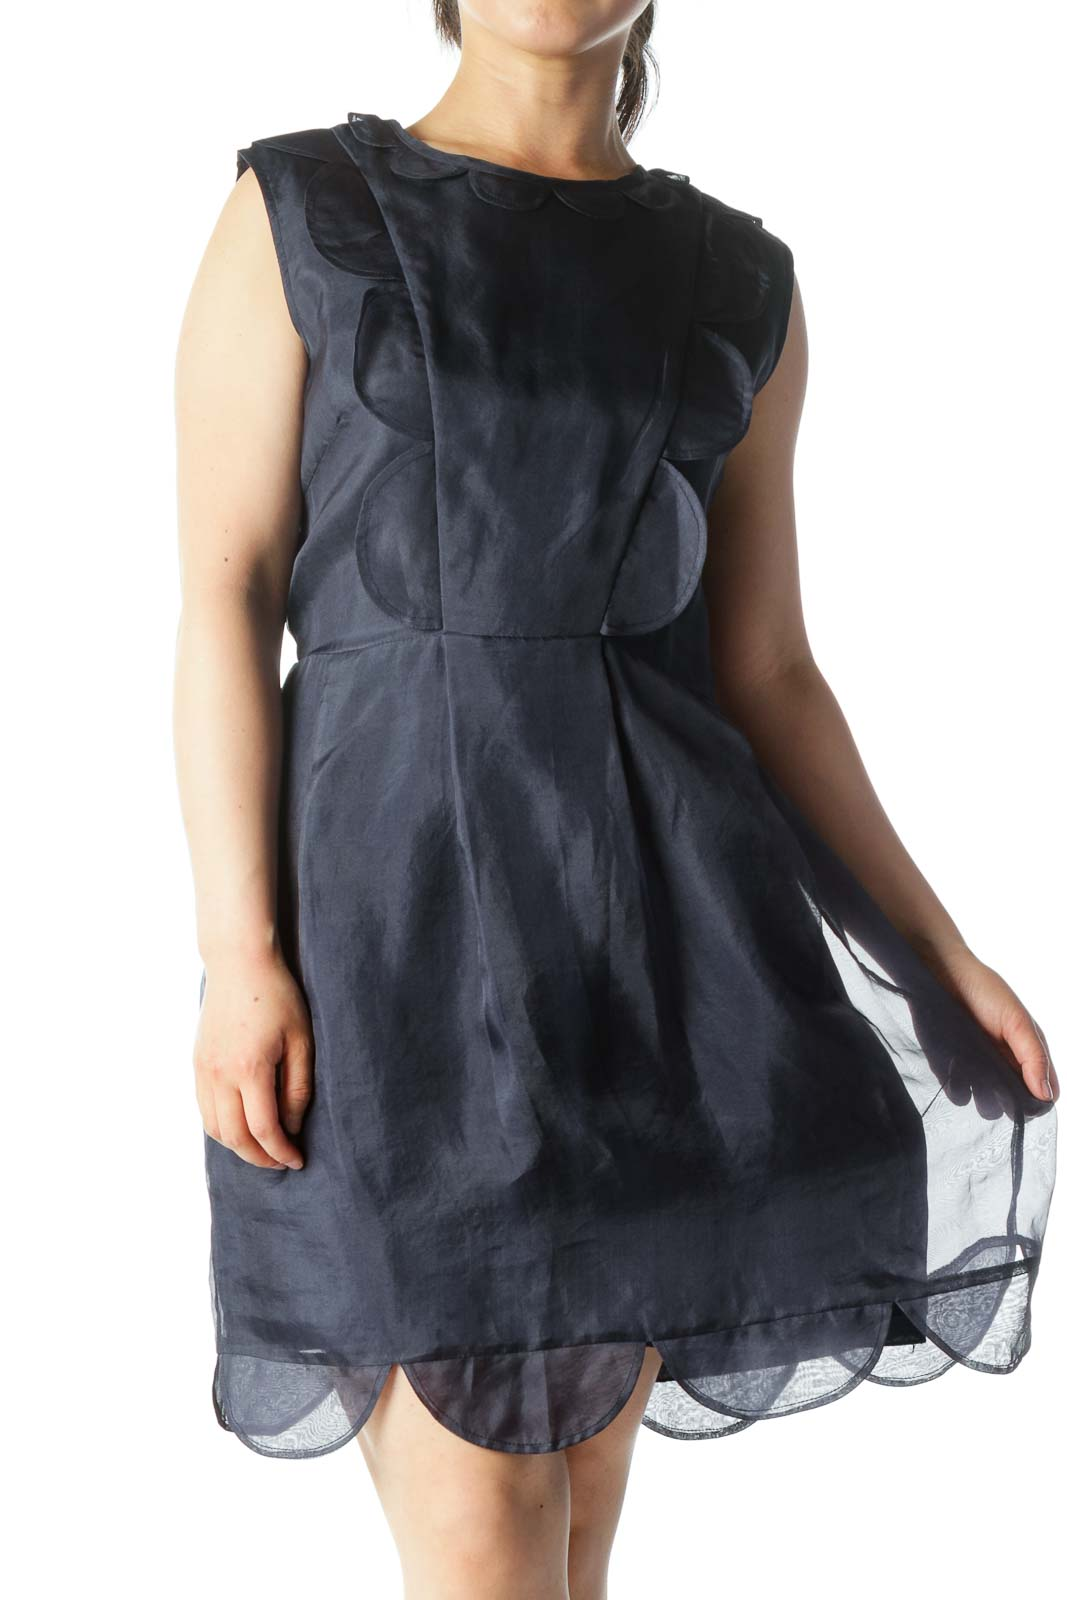 Navy 100% Silk Lettuce-Hem Ruffled Sleeveless Day-Dress Front